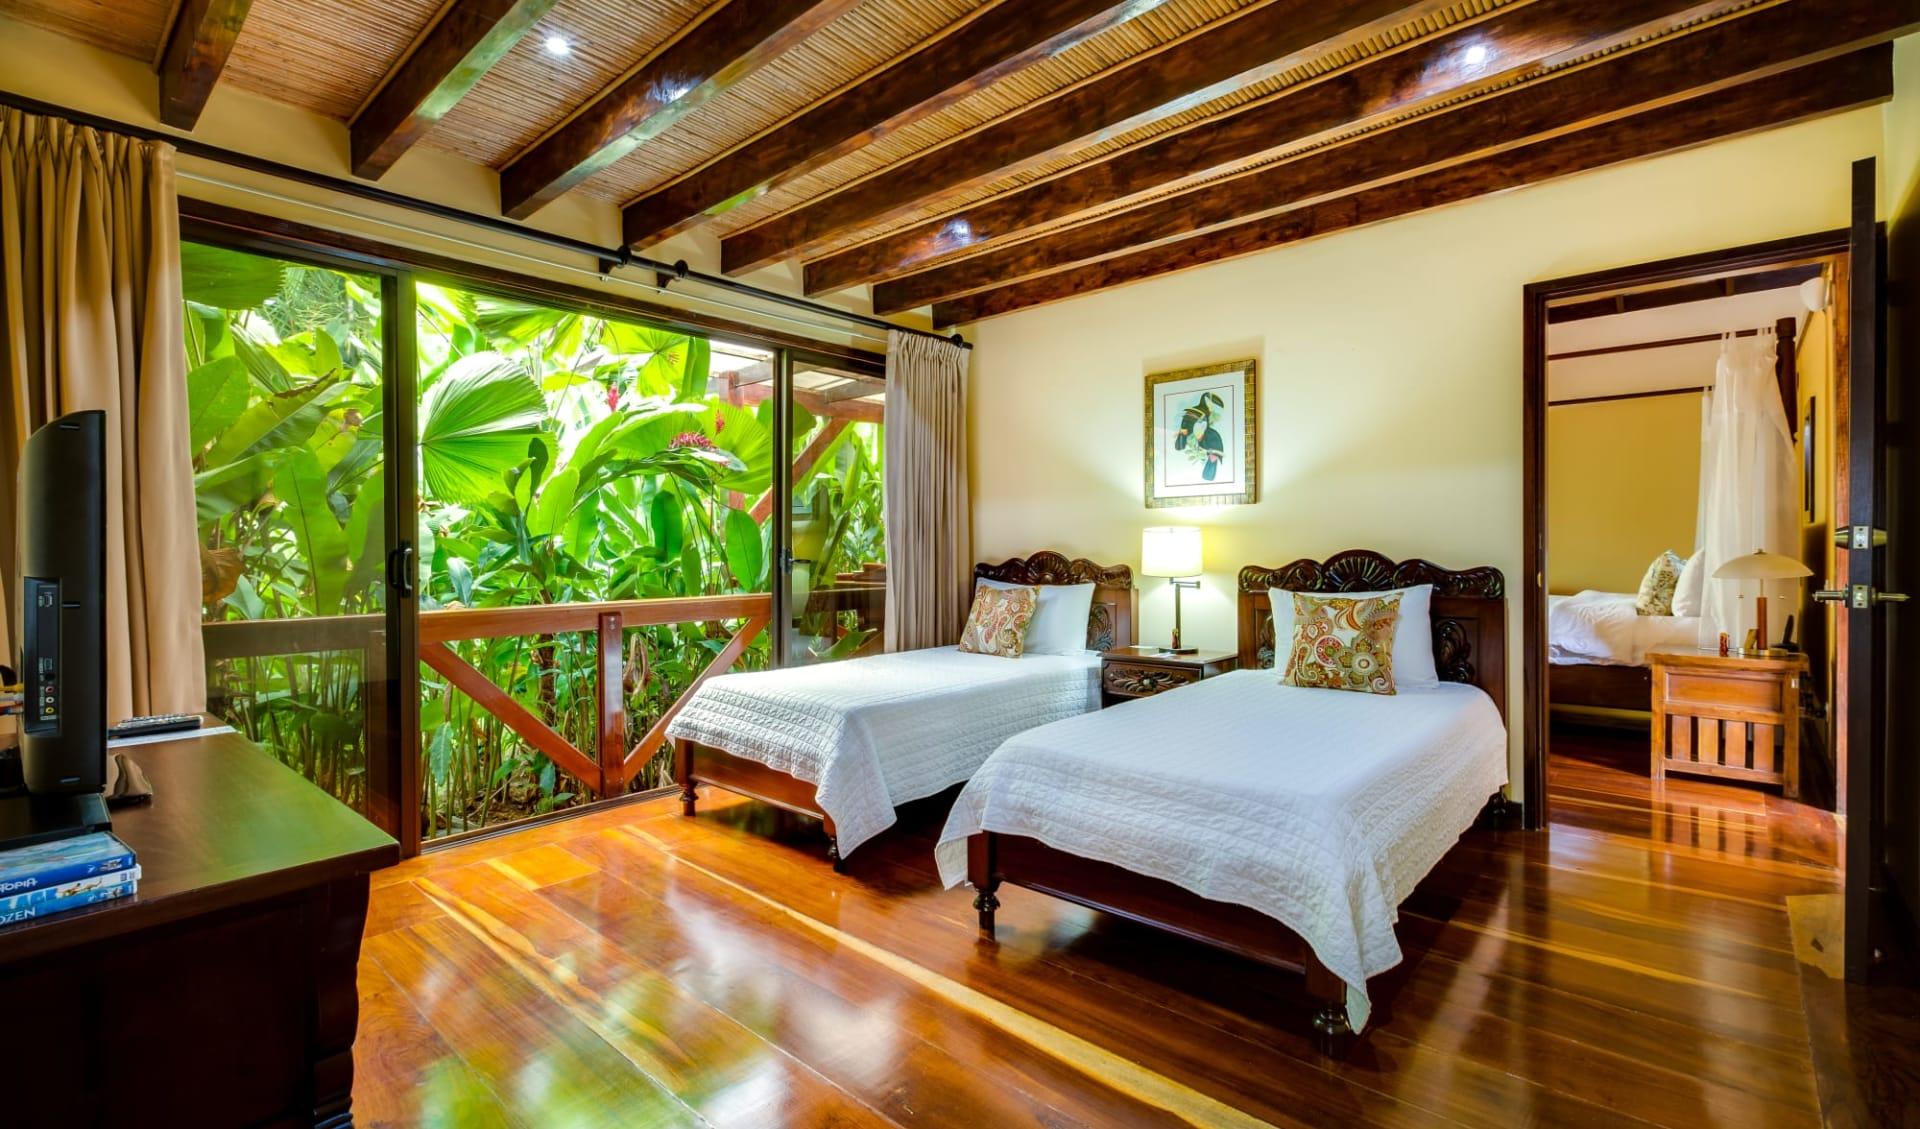 Nayara Resort Spa & Gardens in La Fortuna:  Nayara Gardens Casita Deluxe